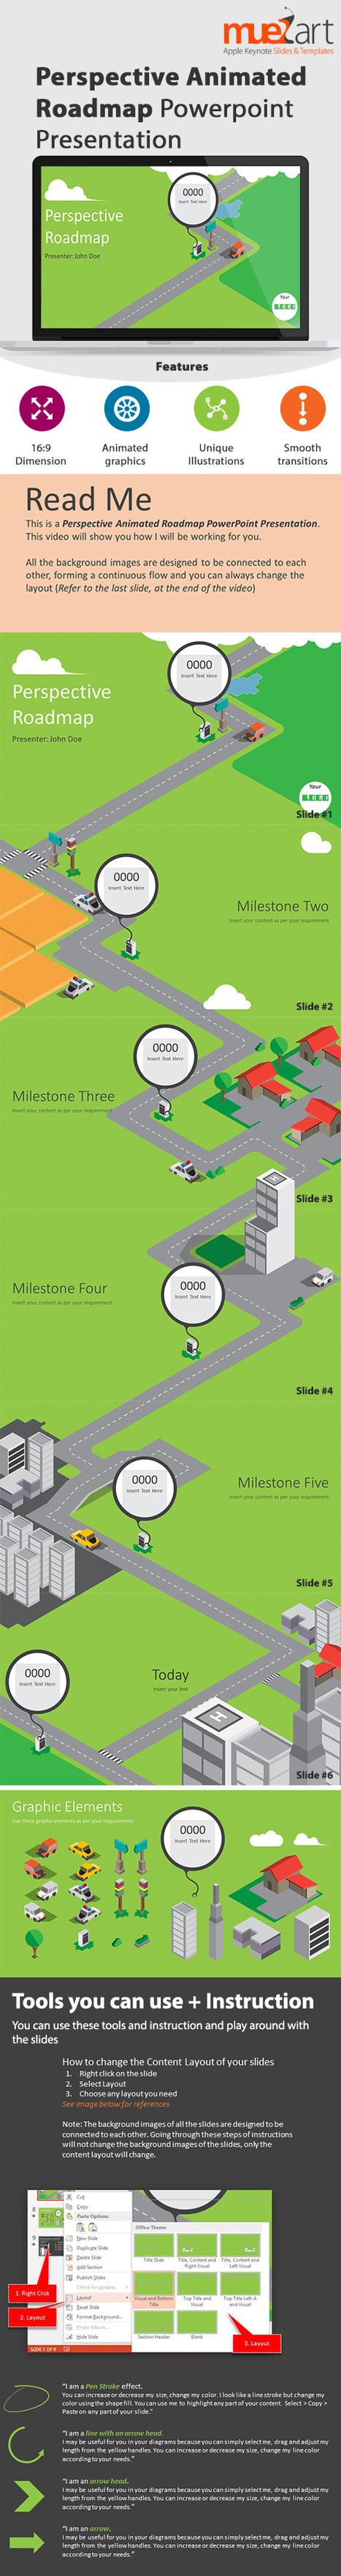 Perspective Roadmap Keynote Template | Apple Keynote Slides For Sale | Scoop.it